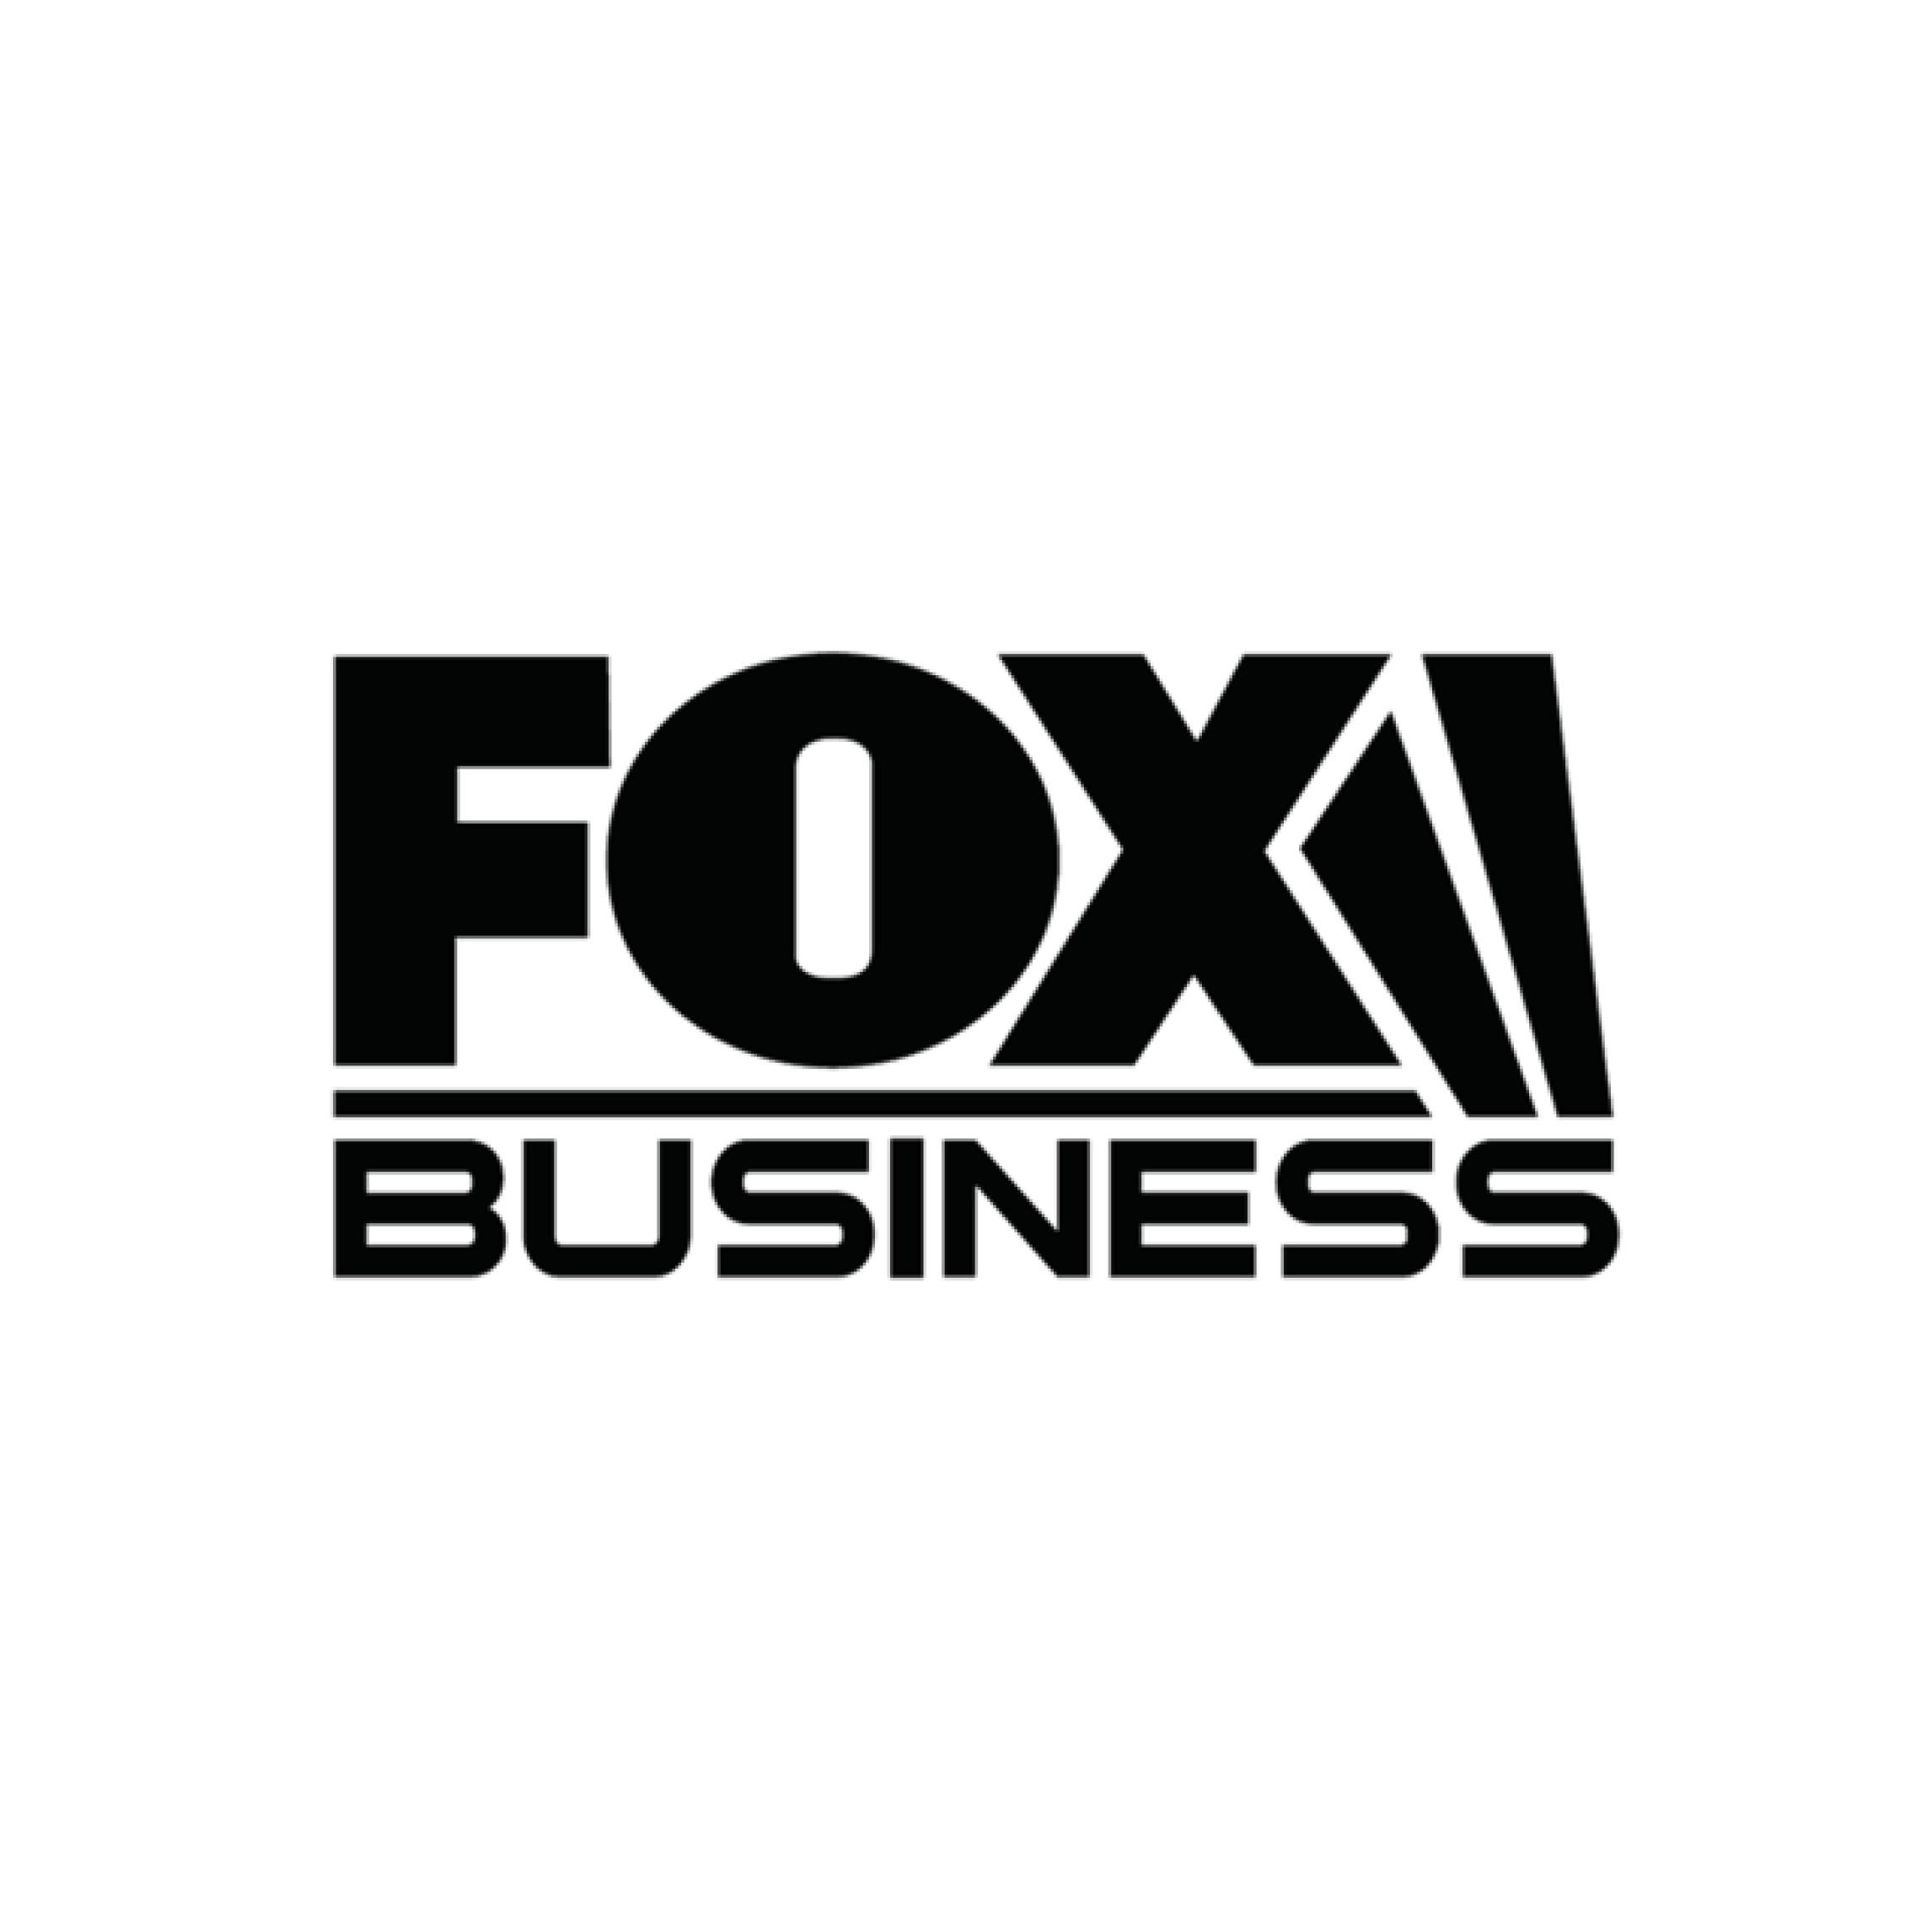 01_Fox_Business.jpg